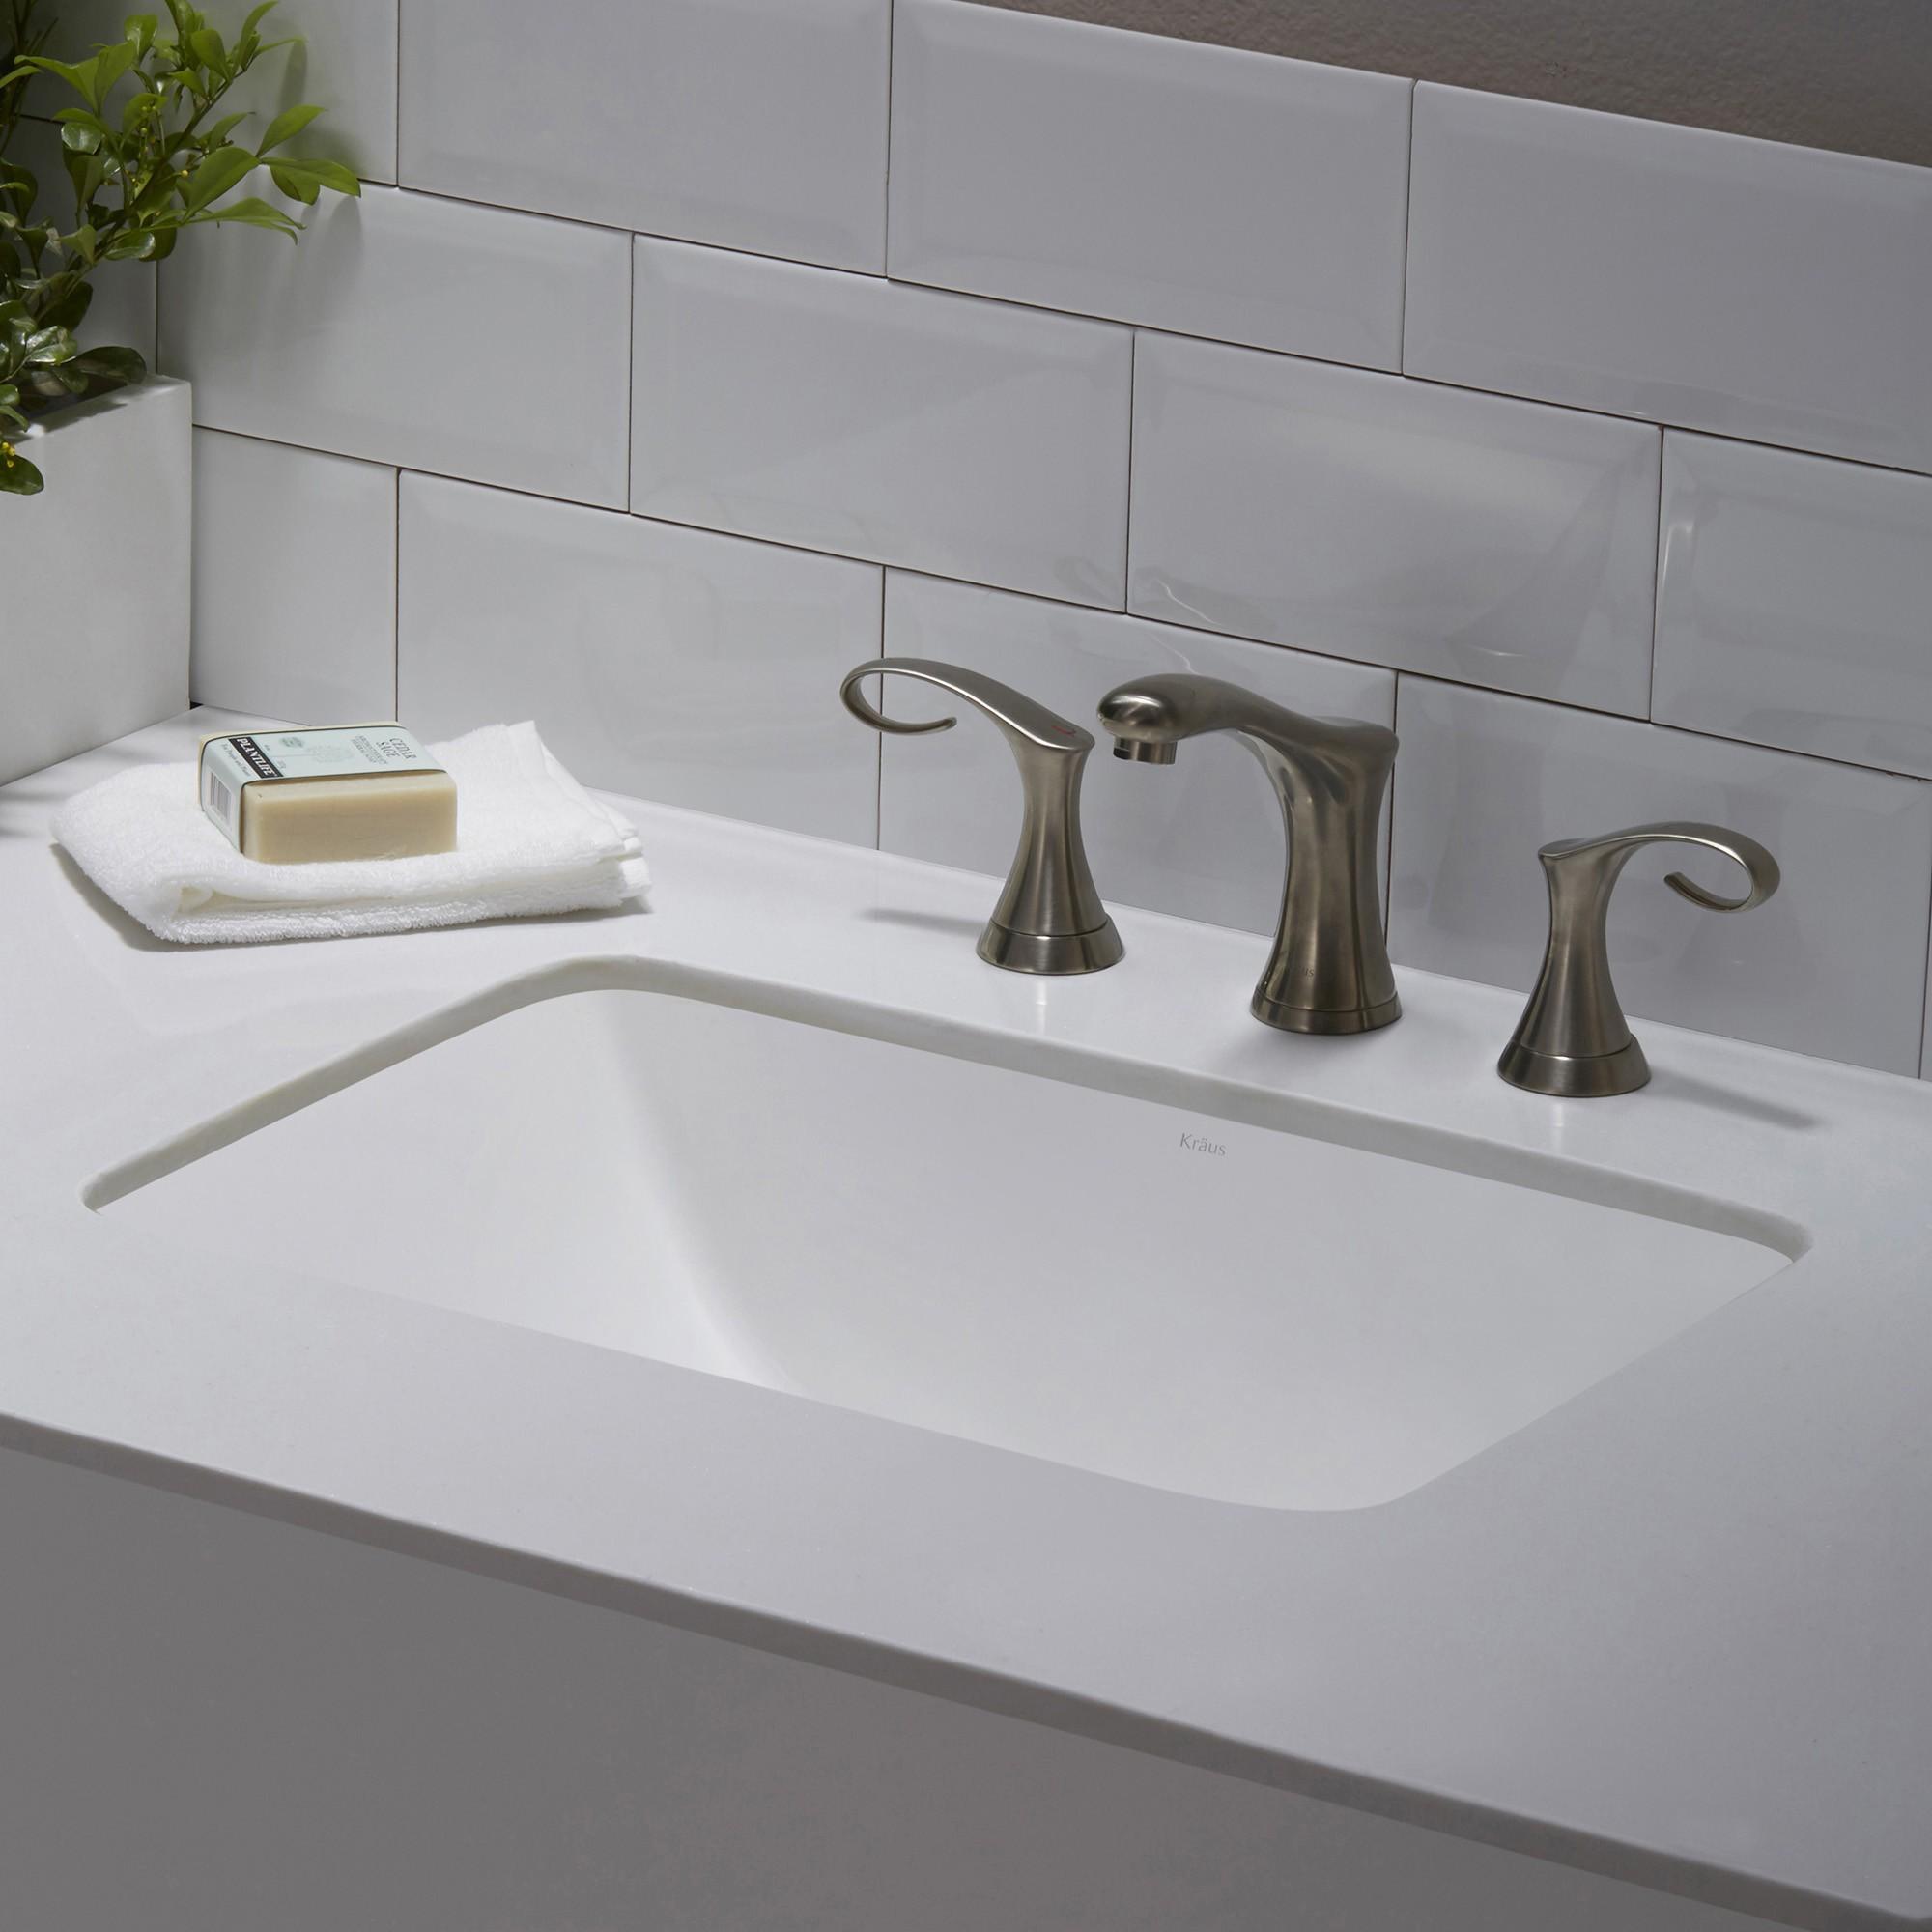 small rectangular undermount bathroom sink full size of bathroom sink:elavo small ceramic rectangular undermount NAFMYCX